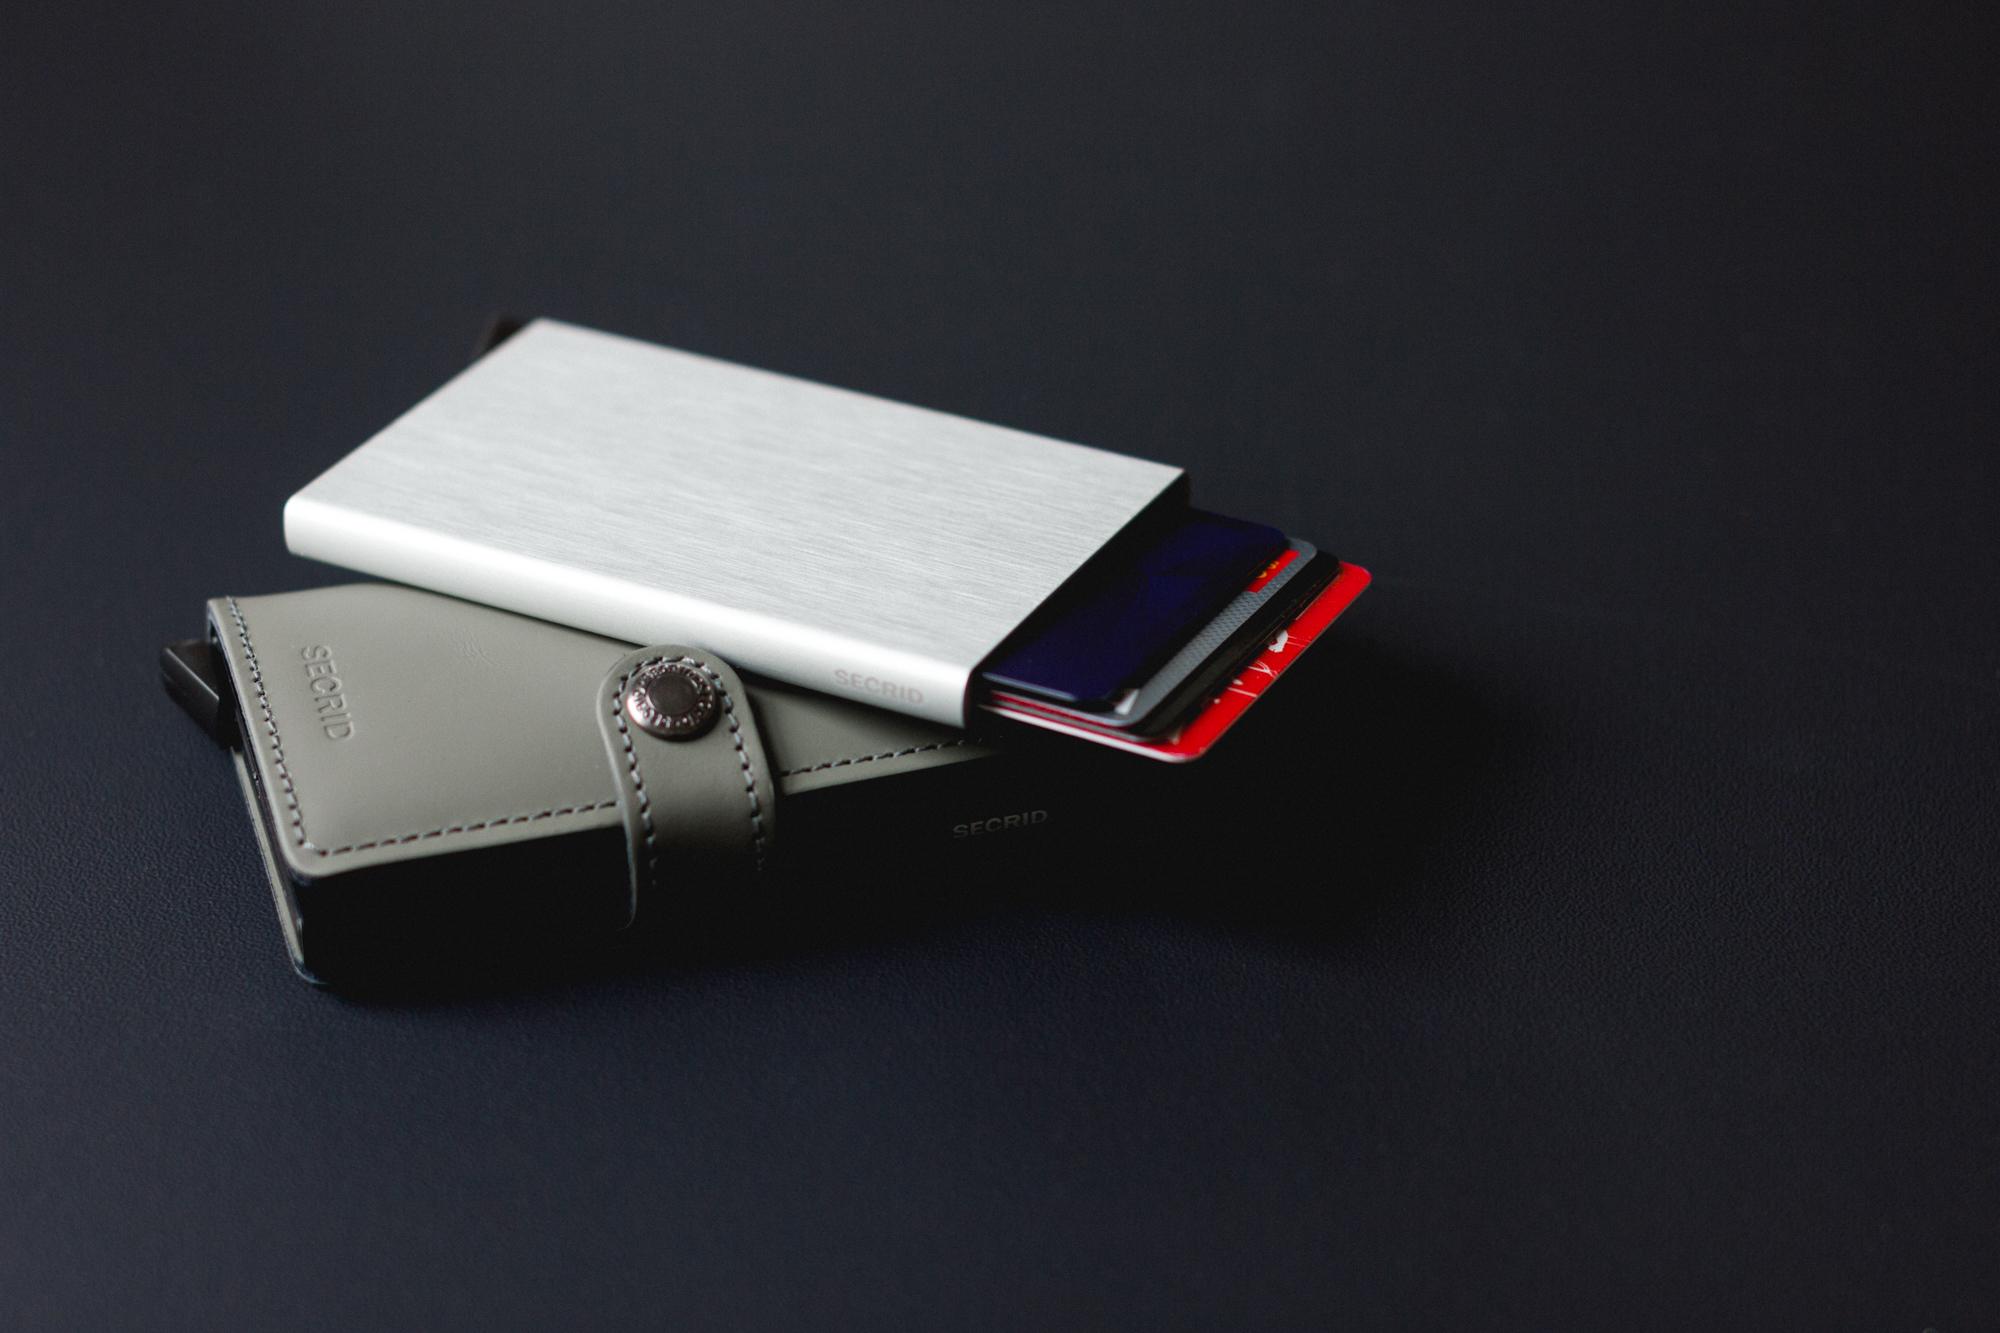 Secrid Slim Wallet Review